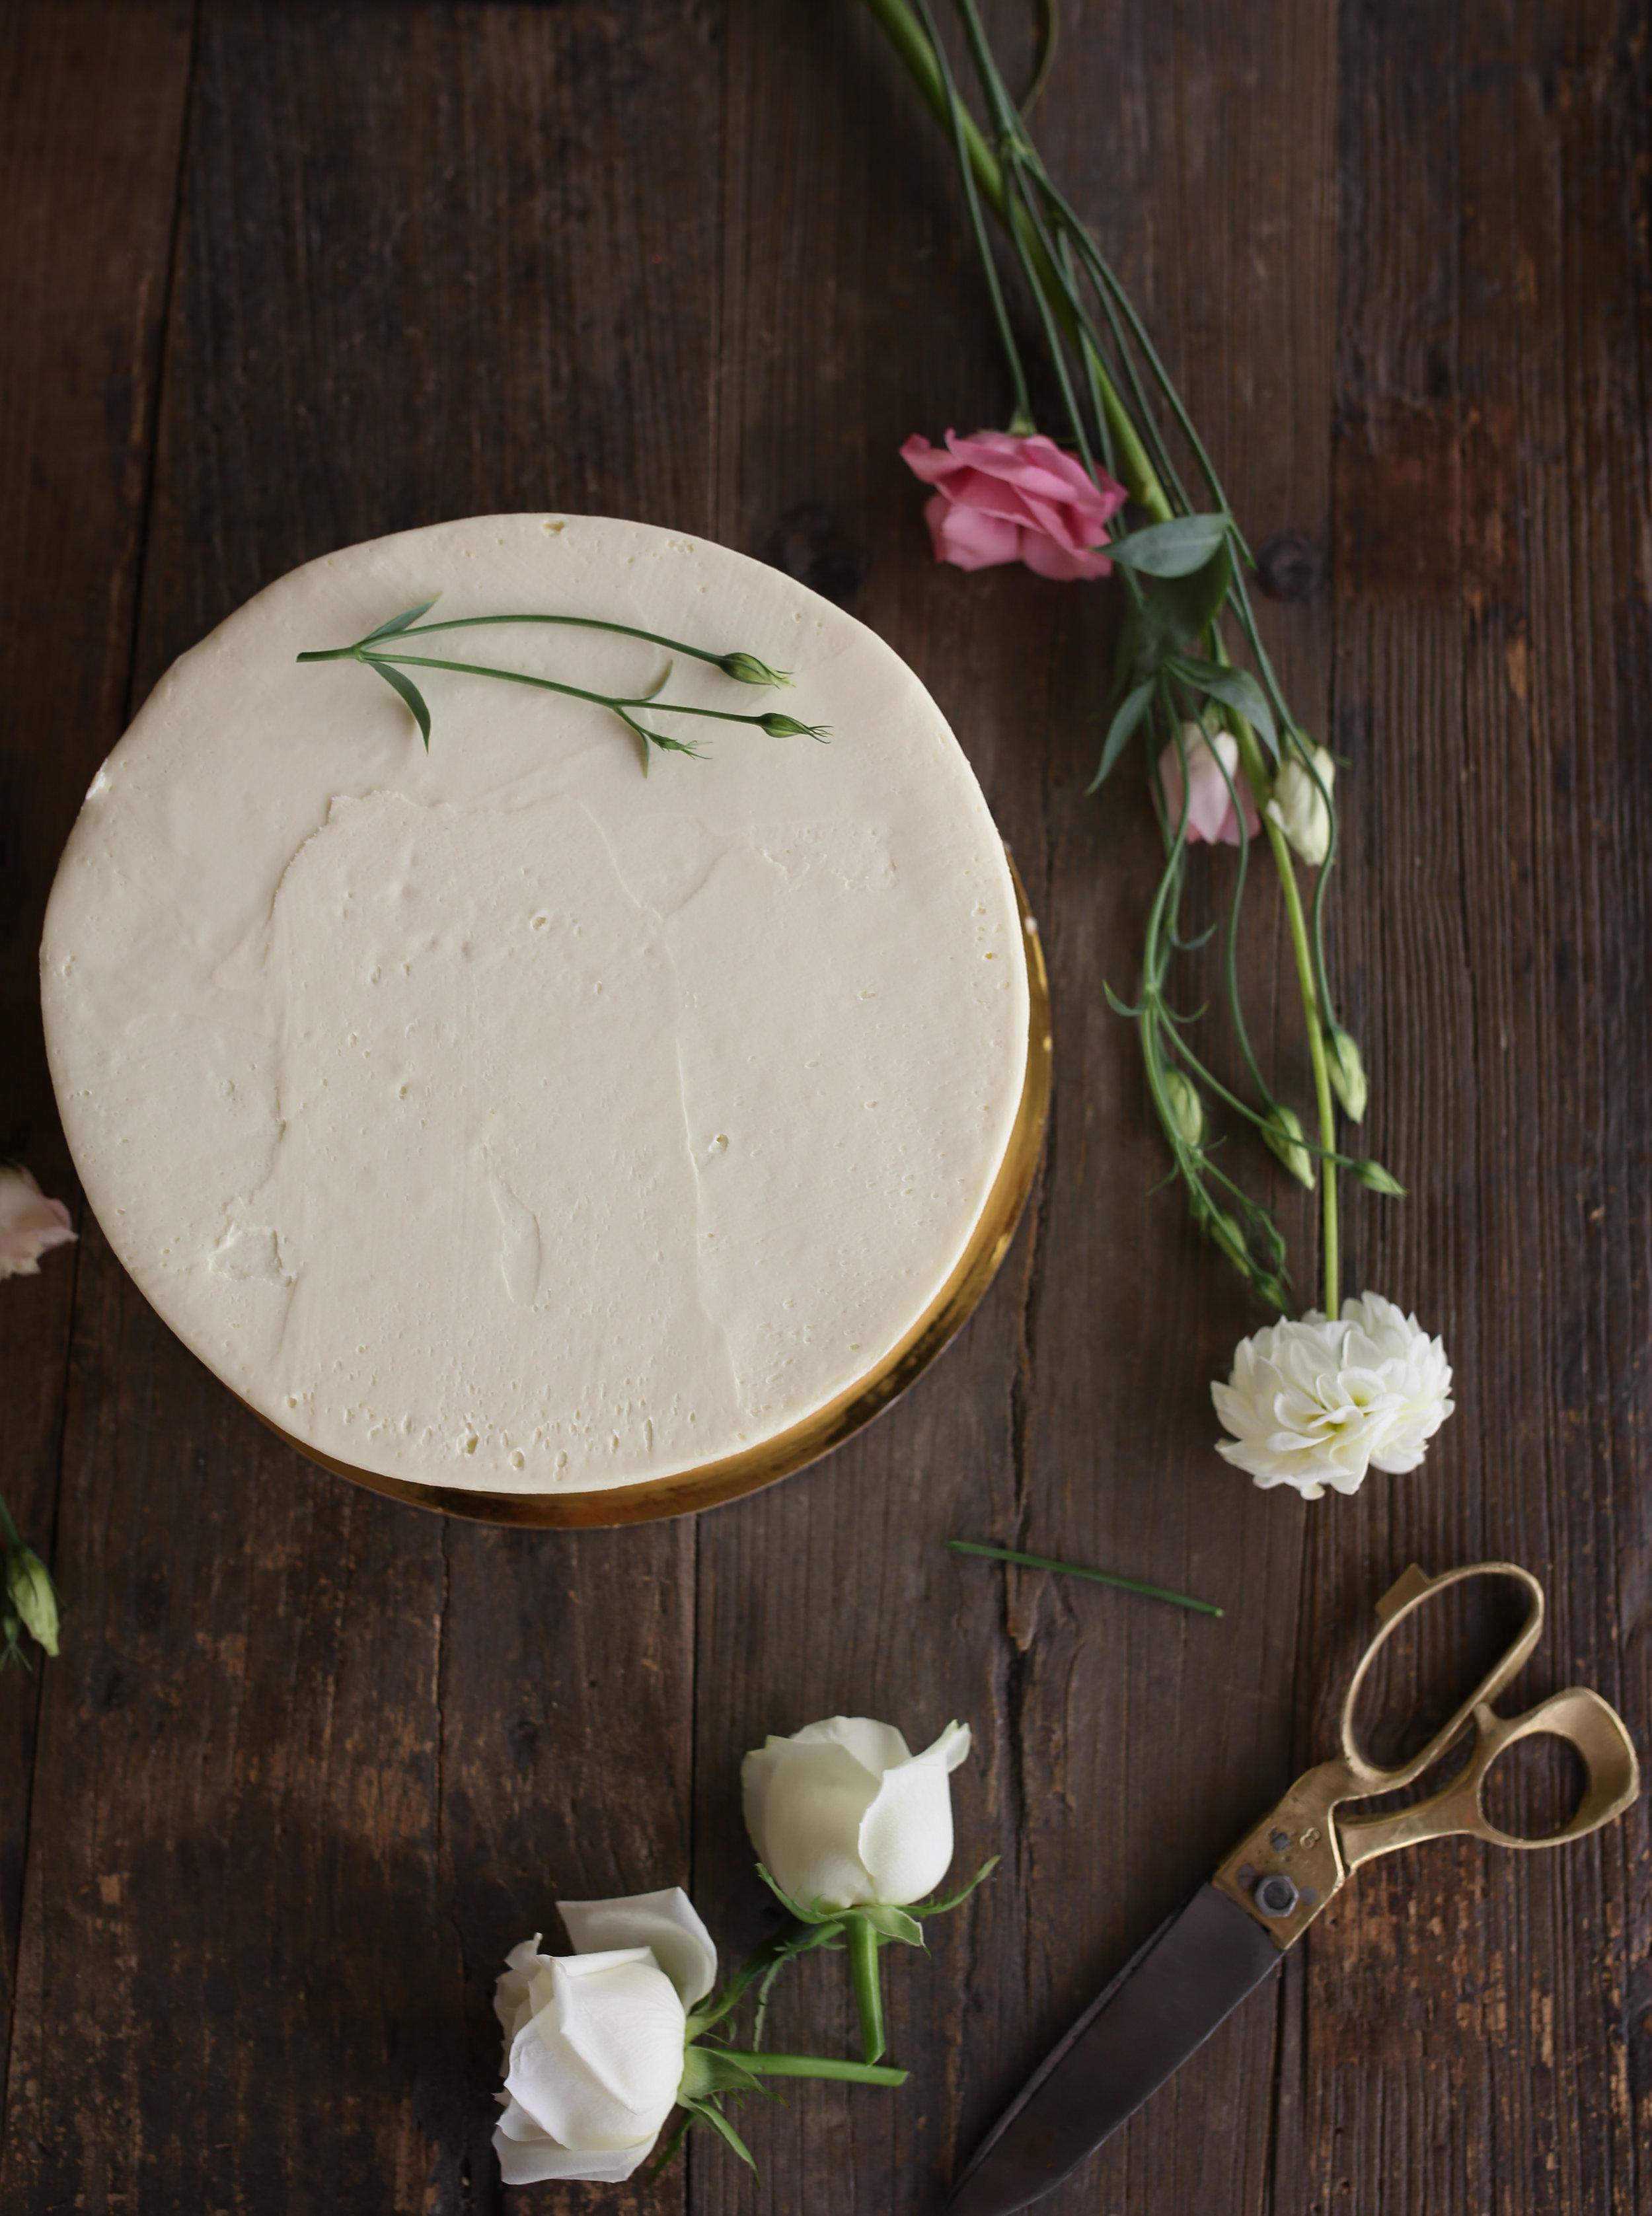 laurennicolefoot-2018-august-11-wedding-engagement-cake-7.jpg